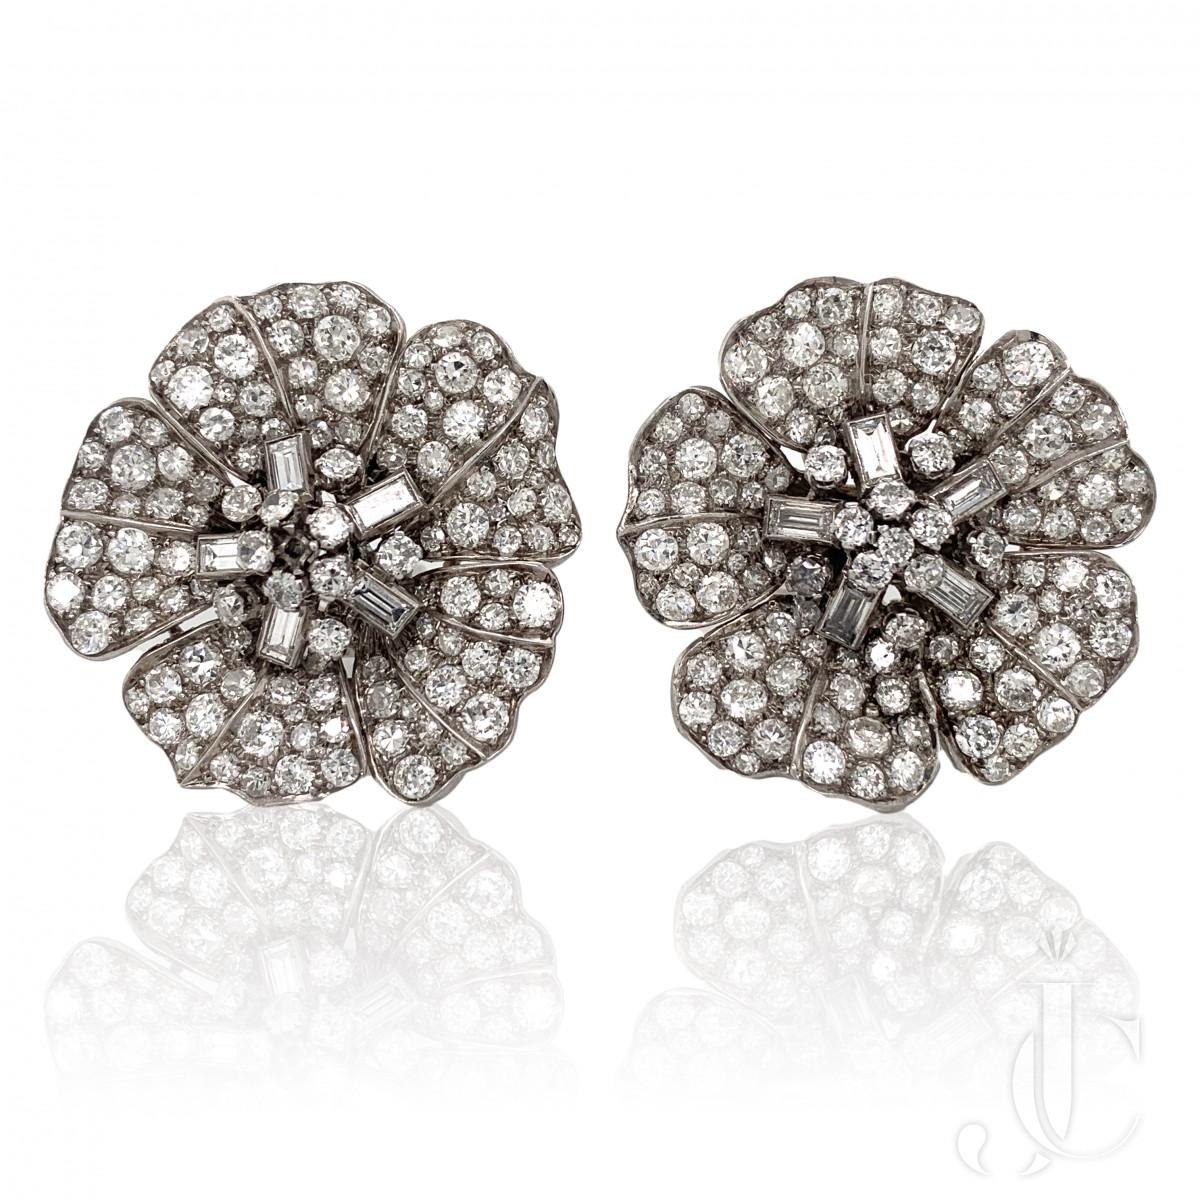 ART DECO PLATINUM DIAMOND 14CTS FLOWER EARRINGS